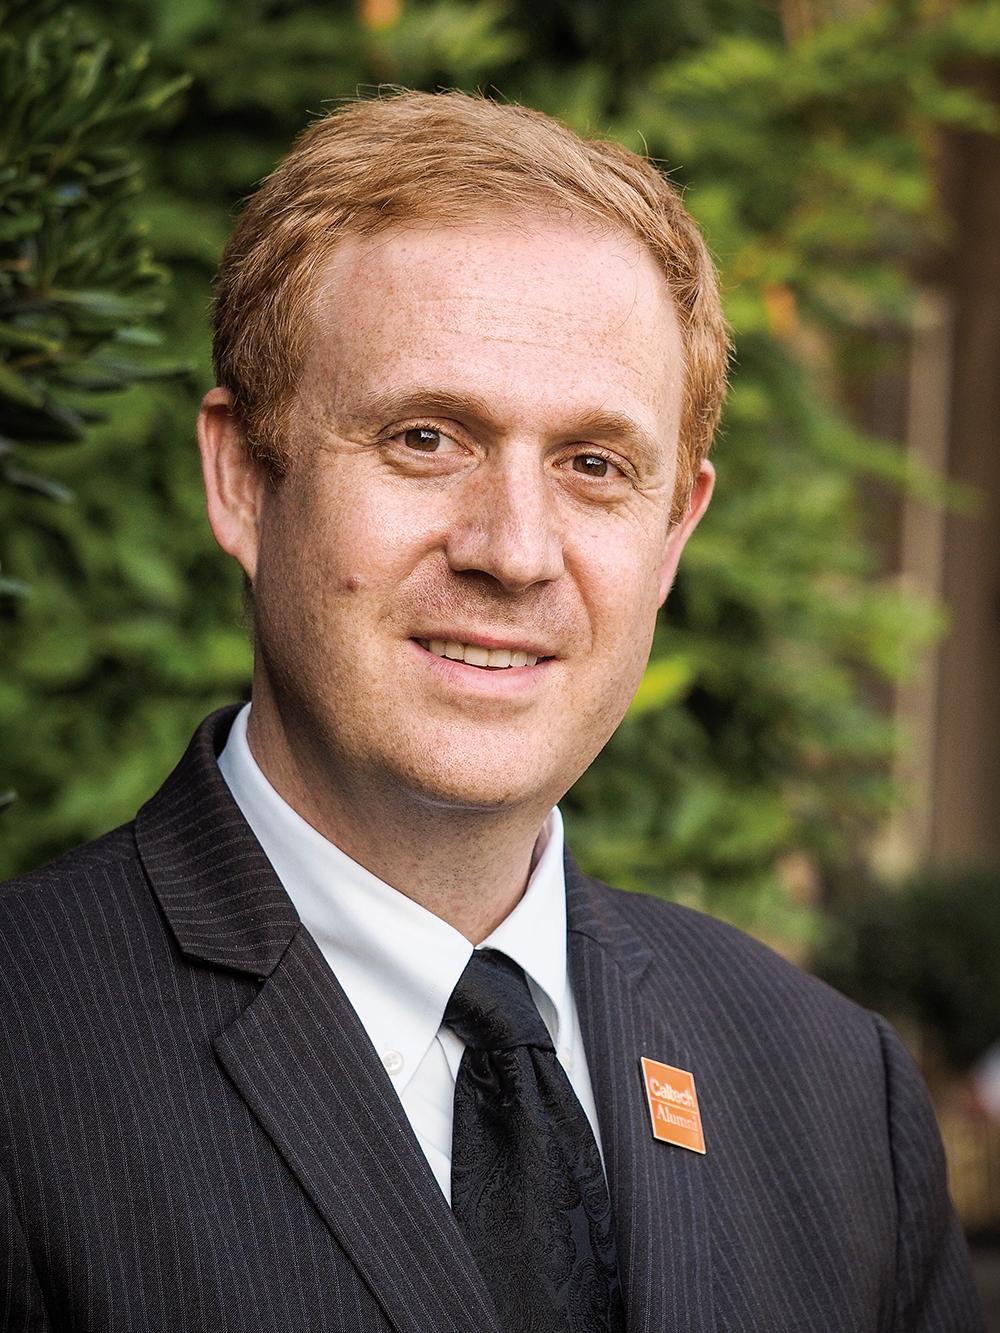 David Tytell, President, Caltech Alumni Association